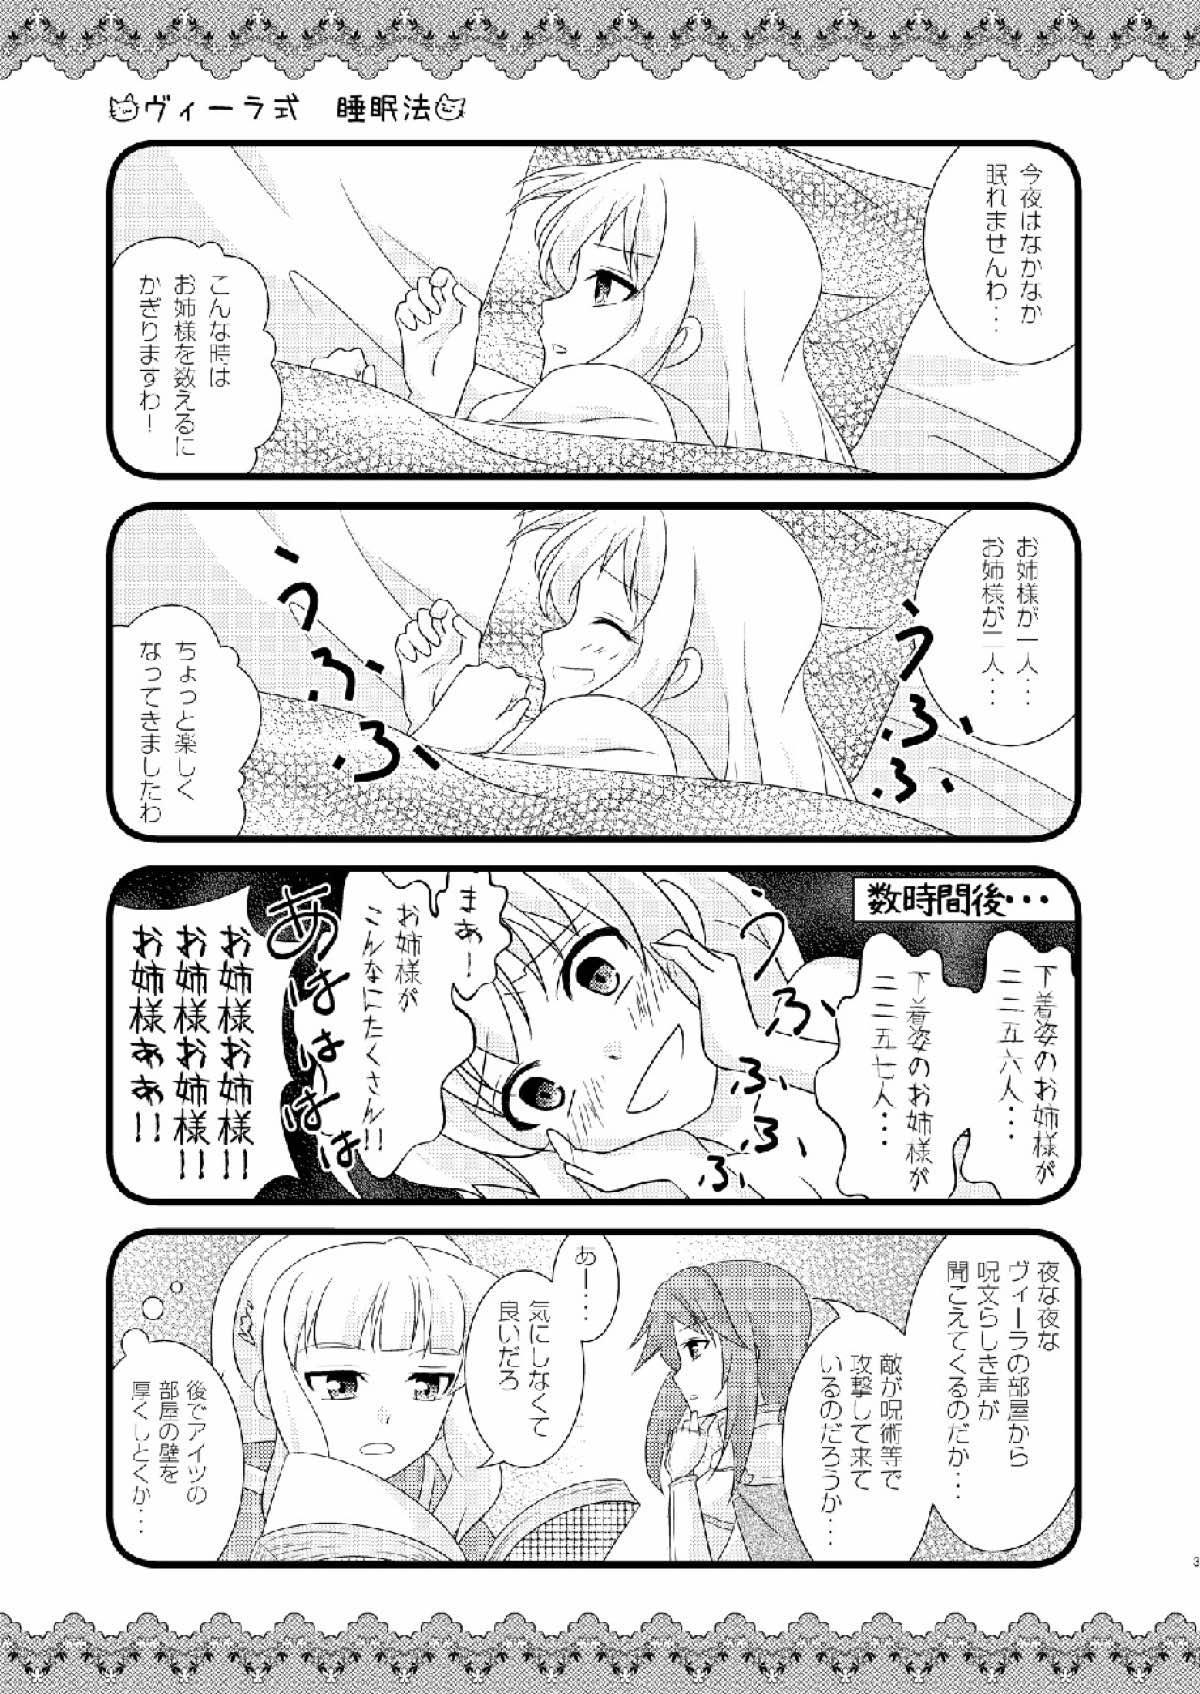 Strawberry Milk Vol. 10 1